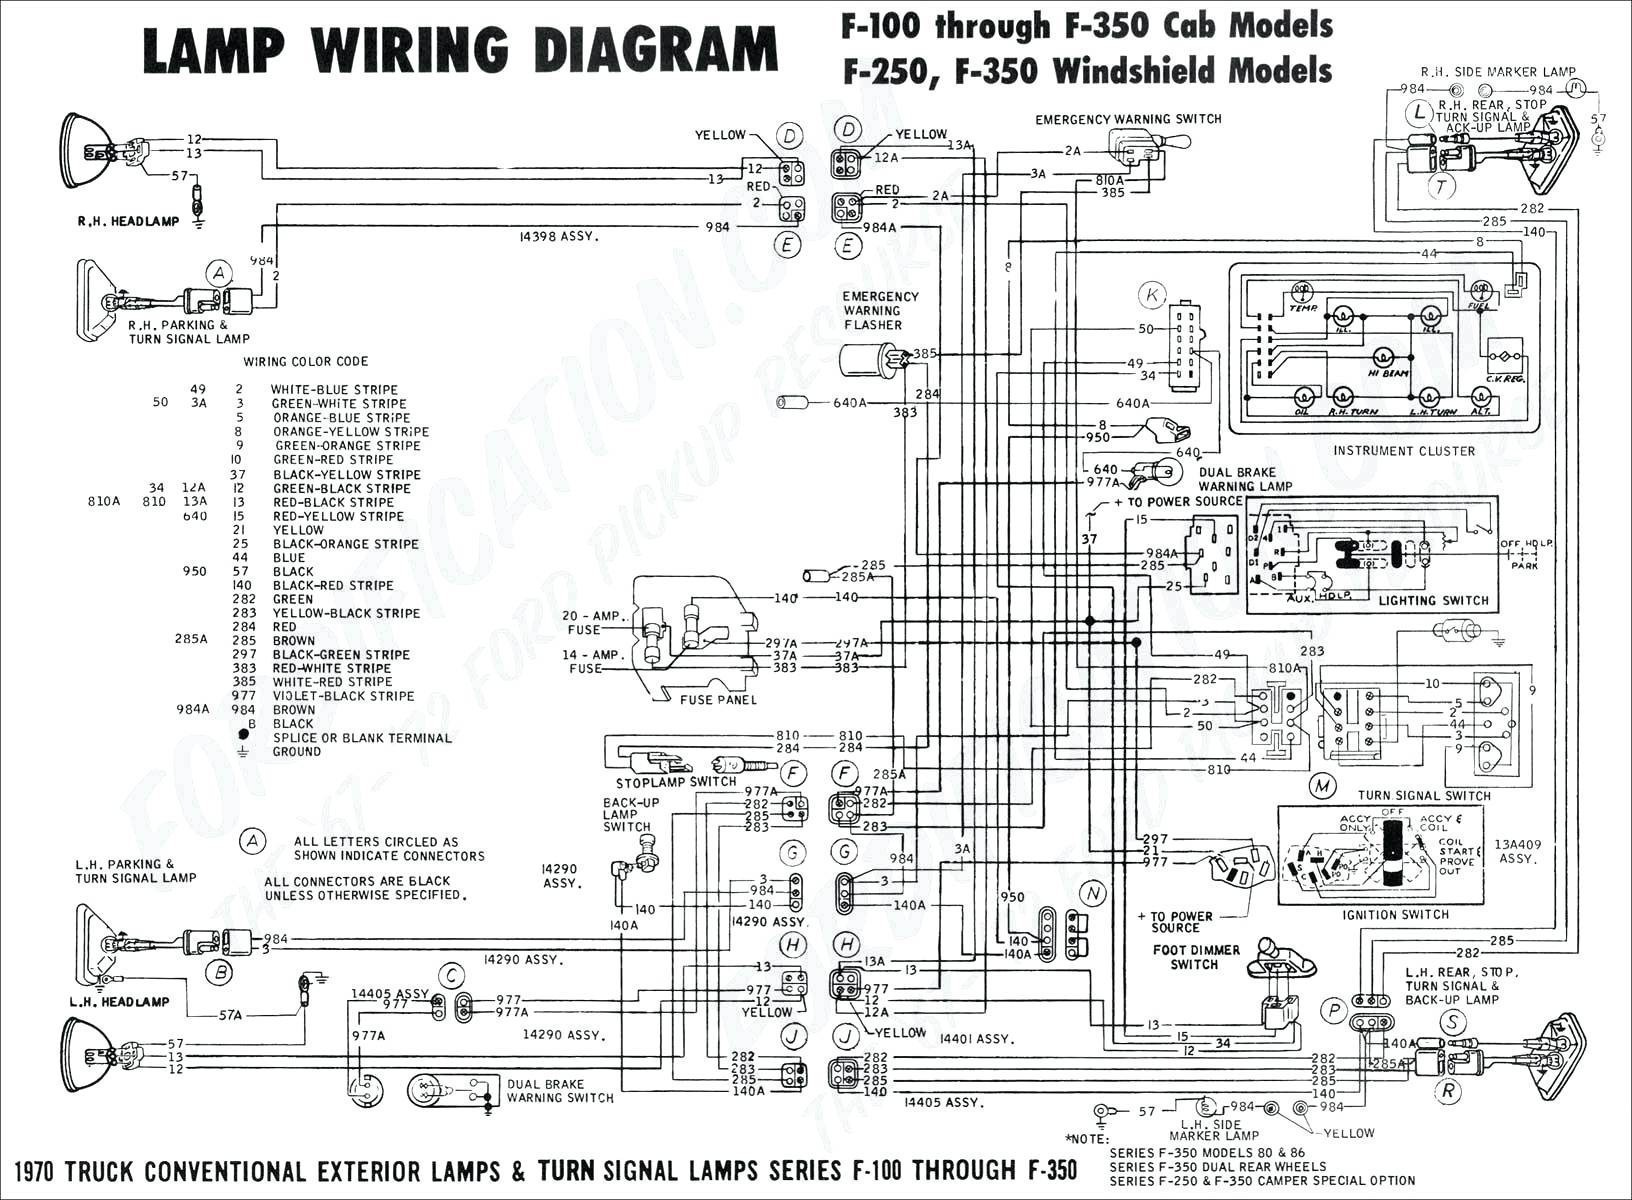 viper 5706v wiring diagram 2014 tundra - wiring diagram res start -  start.ilristorantelabarca.it  ilristorantelabarca.it